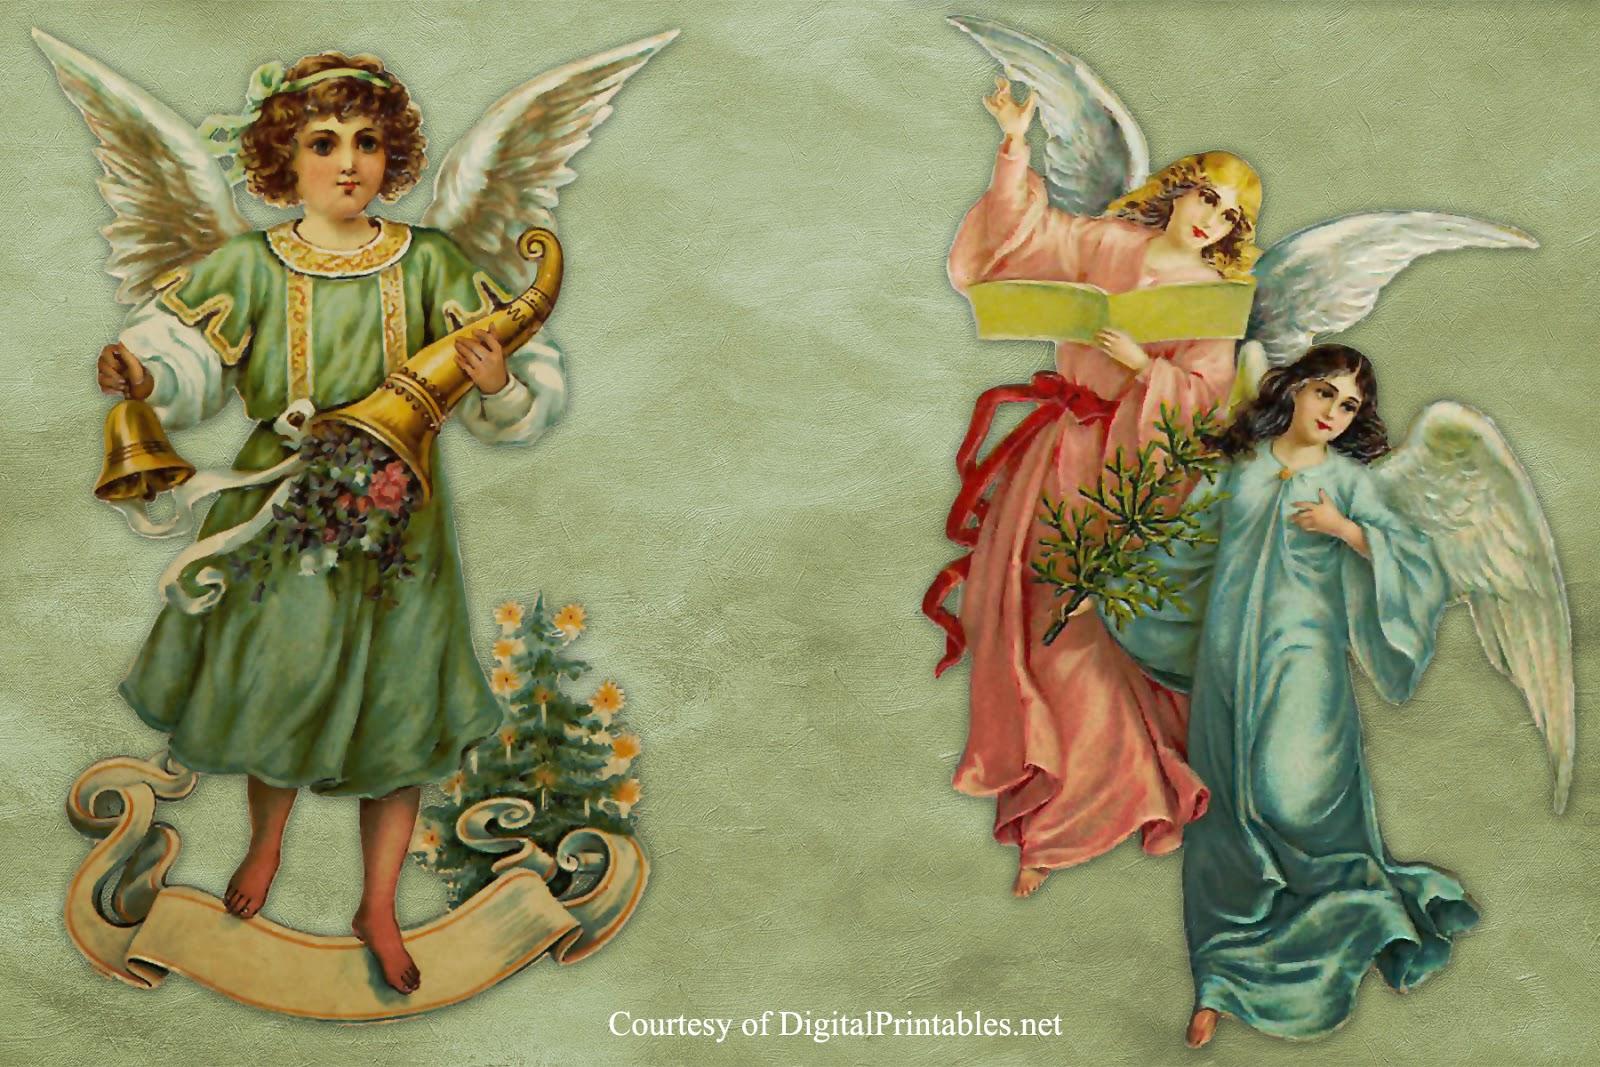 Digital Printables: Free Printable Victorian Christmas Angel Scraps - Free Printable Decoupage Images